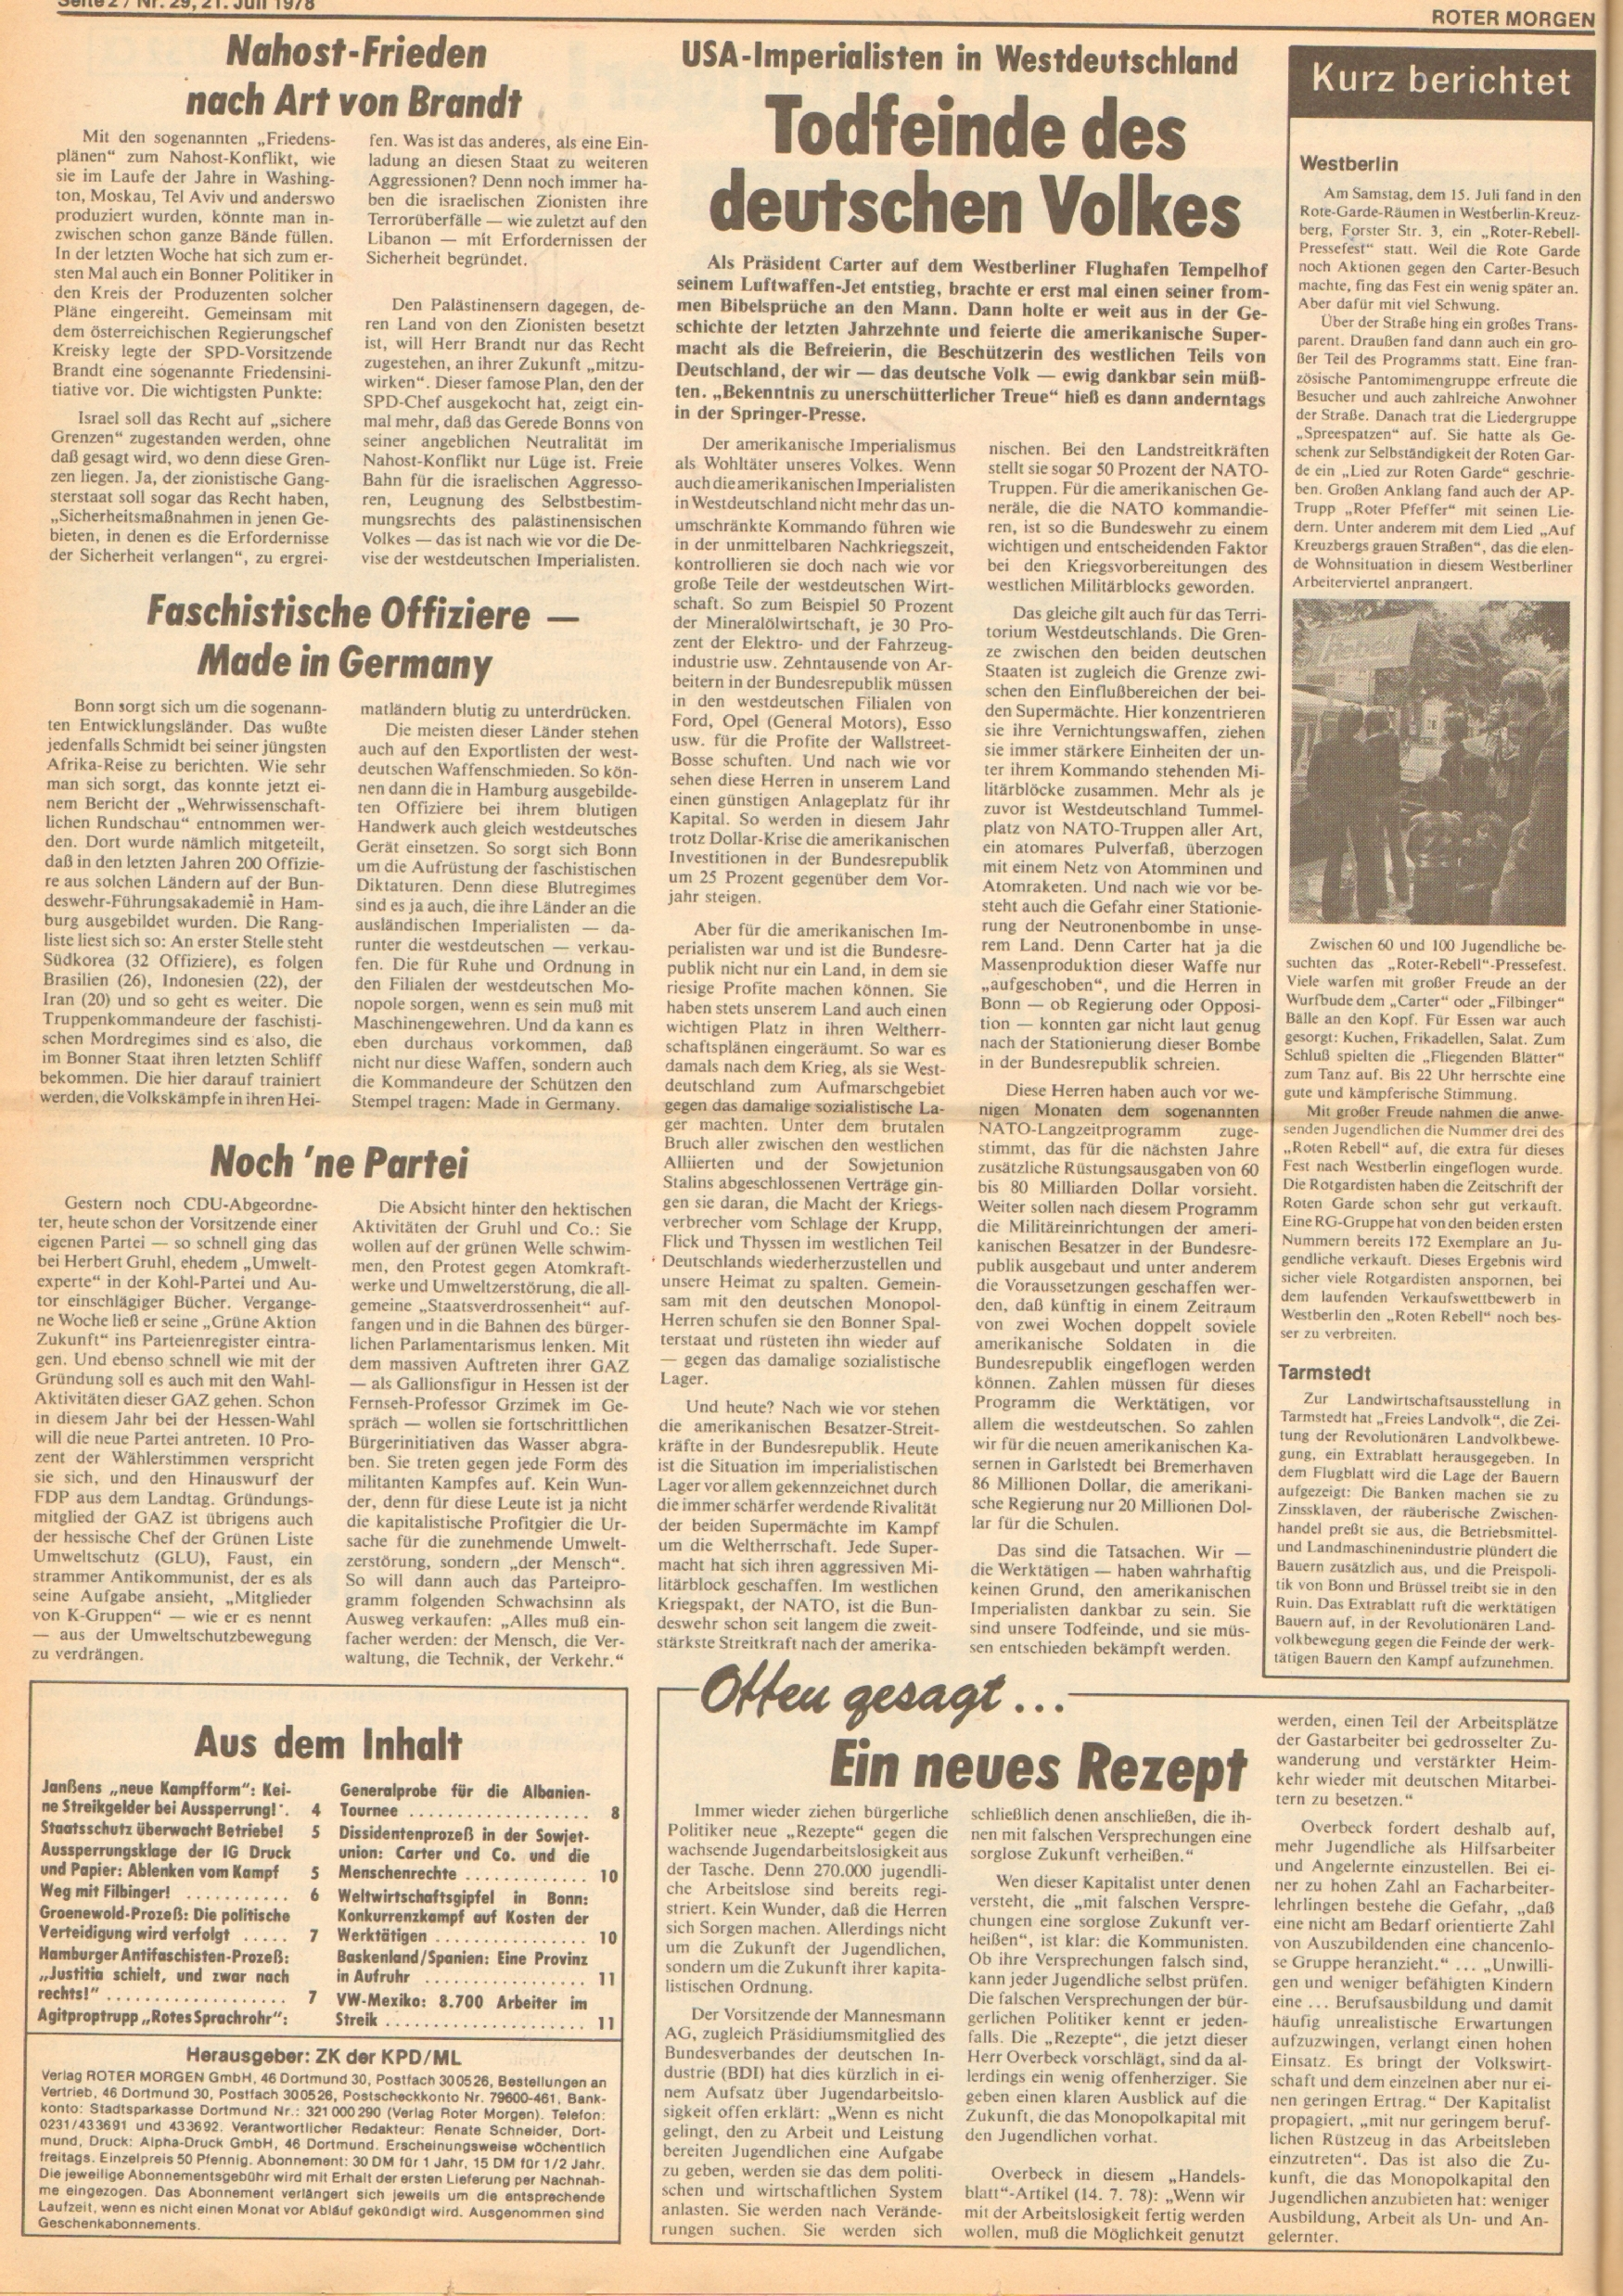 Roter Morgen, 12. Jg., 21. Juli 1978, Nr. 29, Seite 2